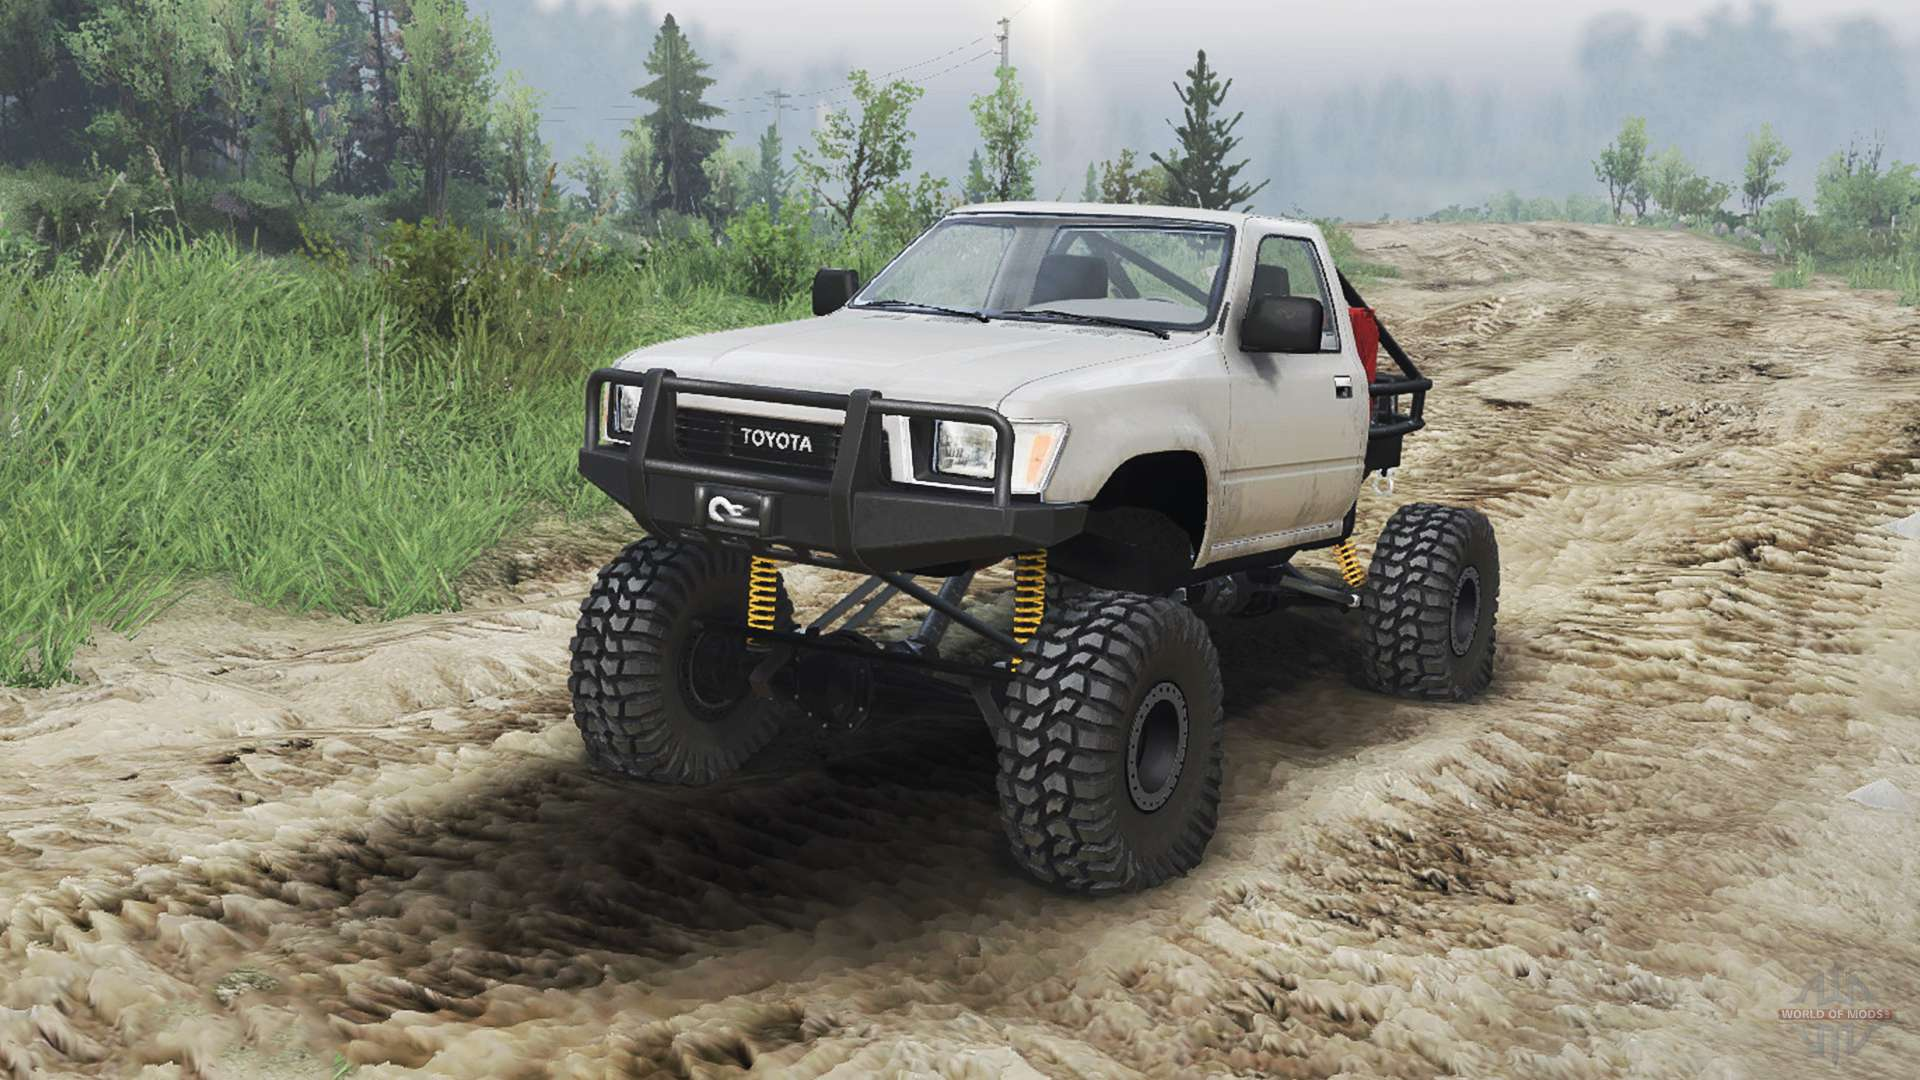 Kelebihan Toyota Hilux 1990 Murah Berkualitas